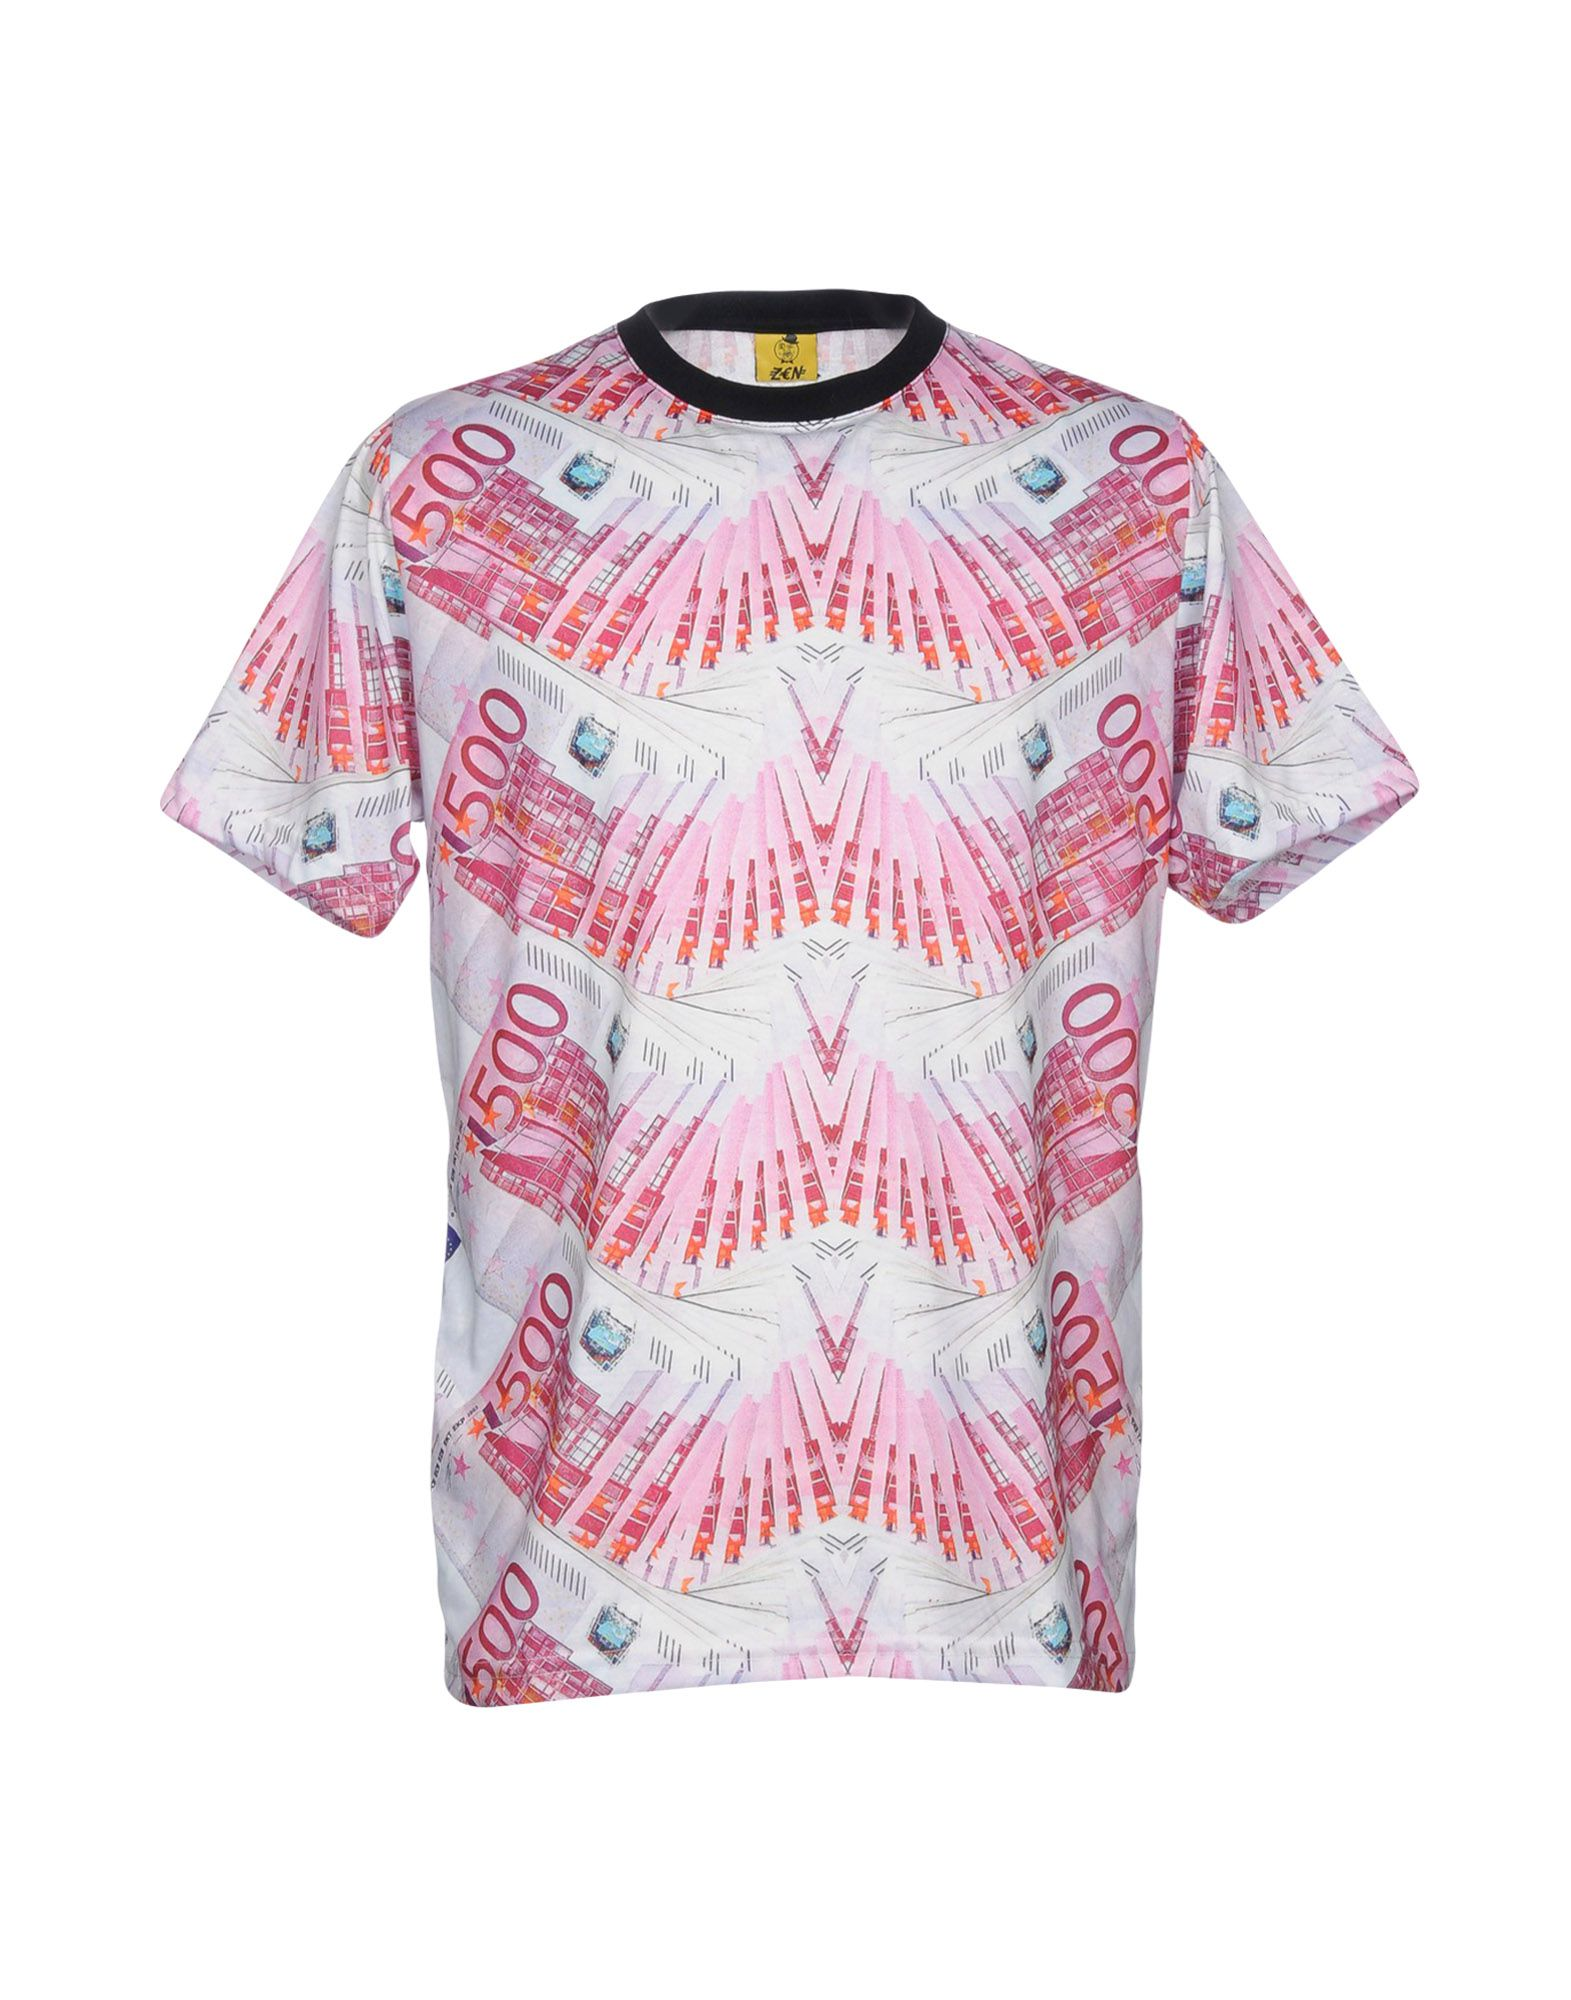 A buon mercato A buon mercato T-Shirt Uomo Zen Uomo T-Shirt - 12173502UR 022dad